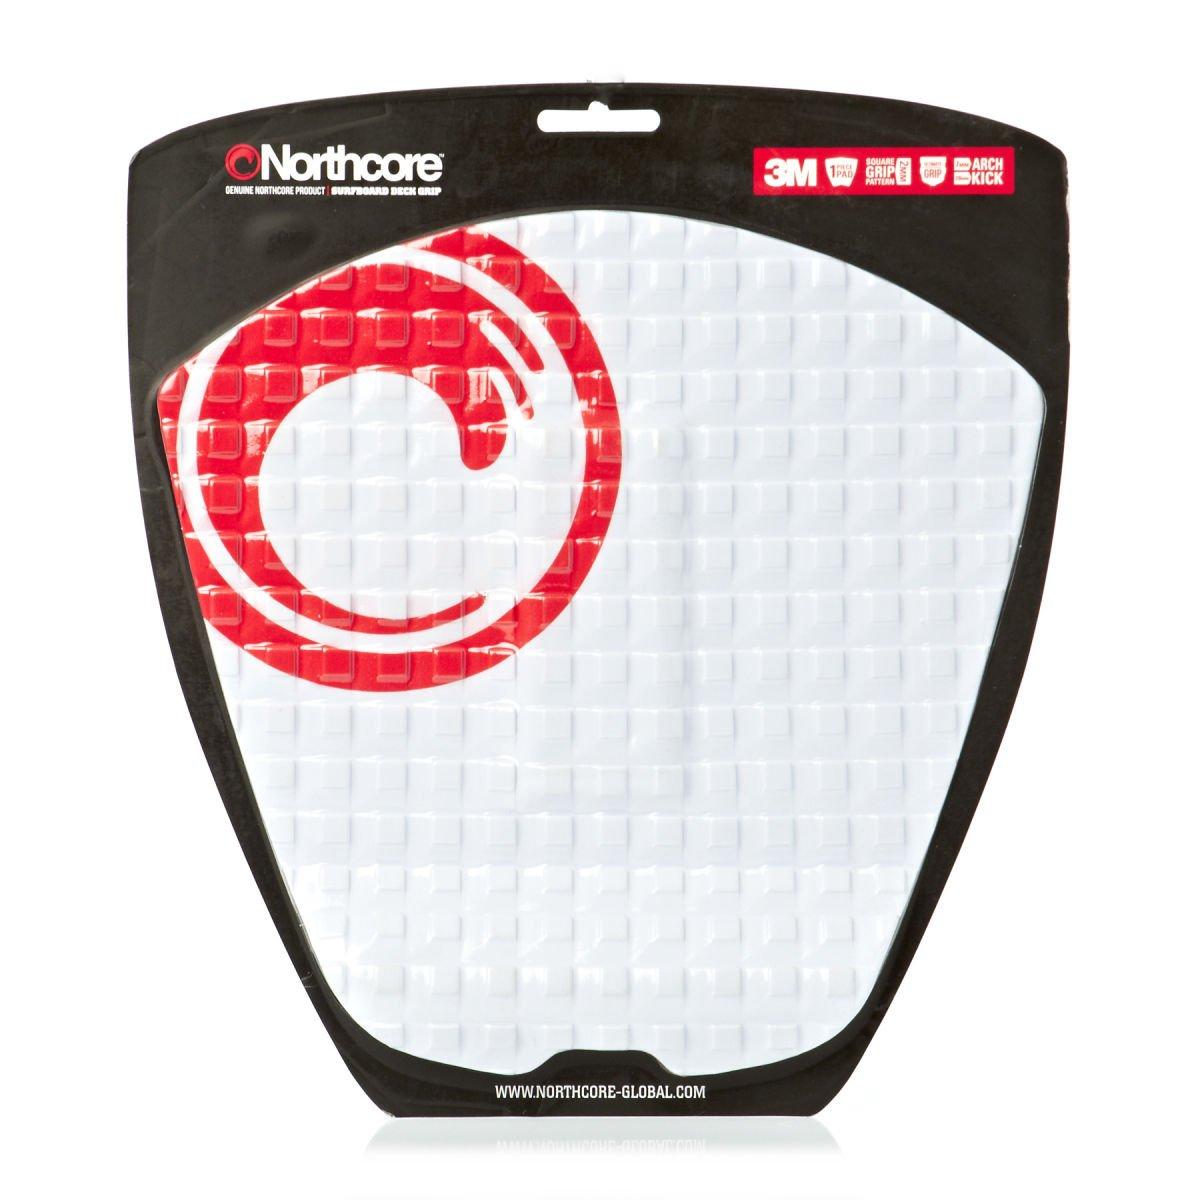 Northcore Ultimate Grip Deck Pad WHITE NOCO63B Colour - White